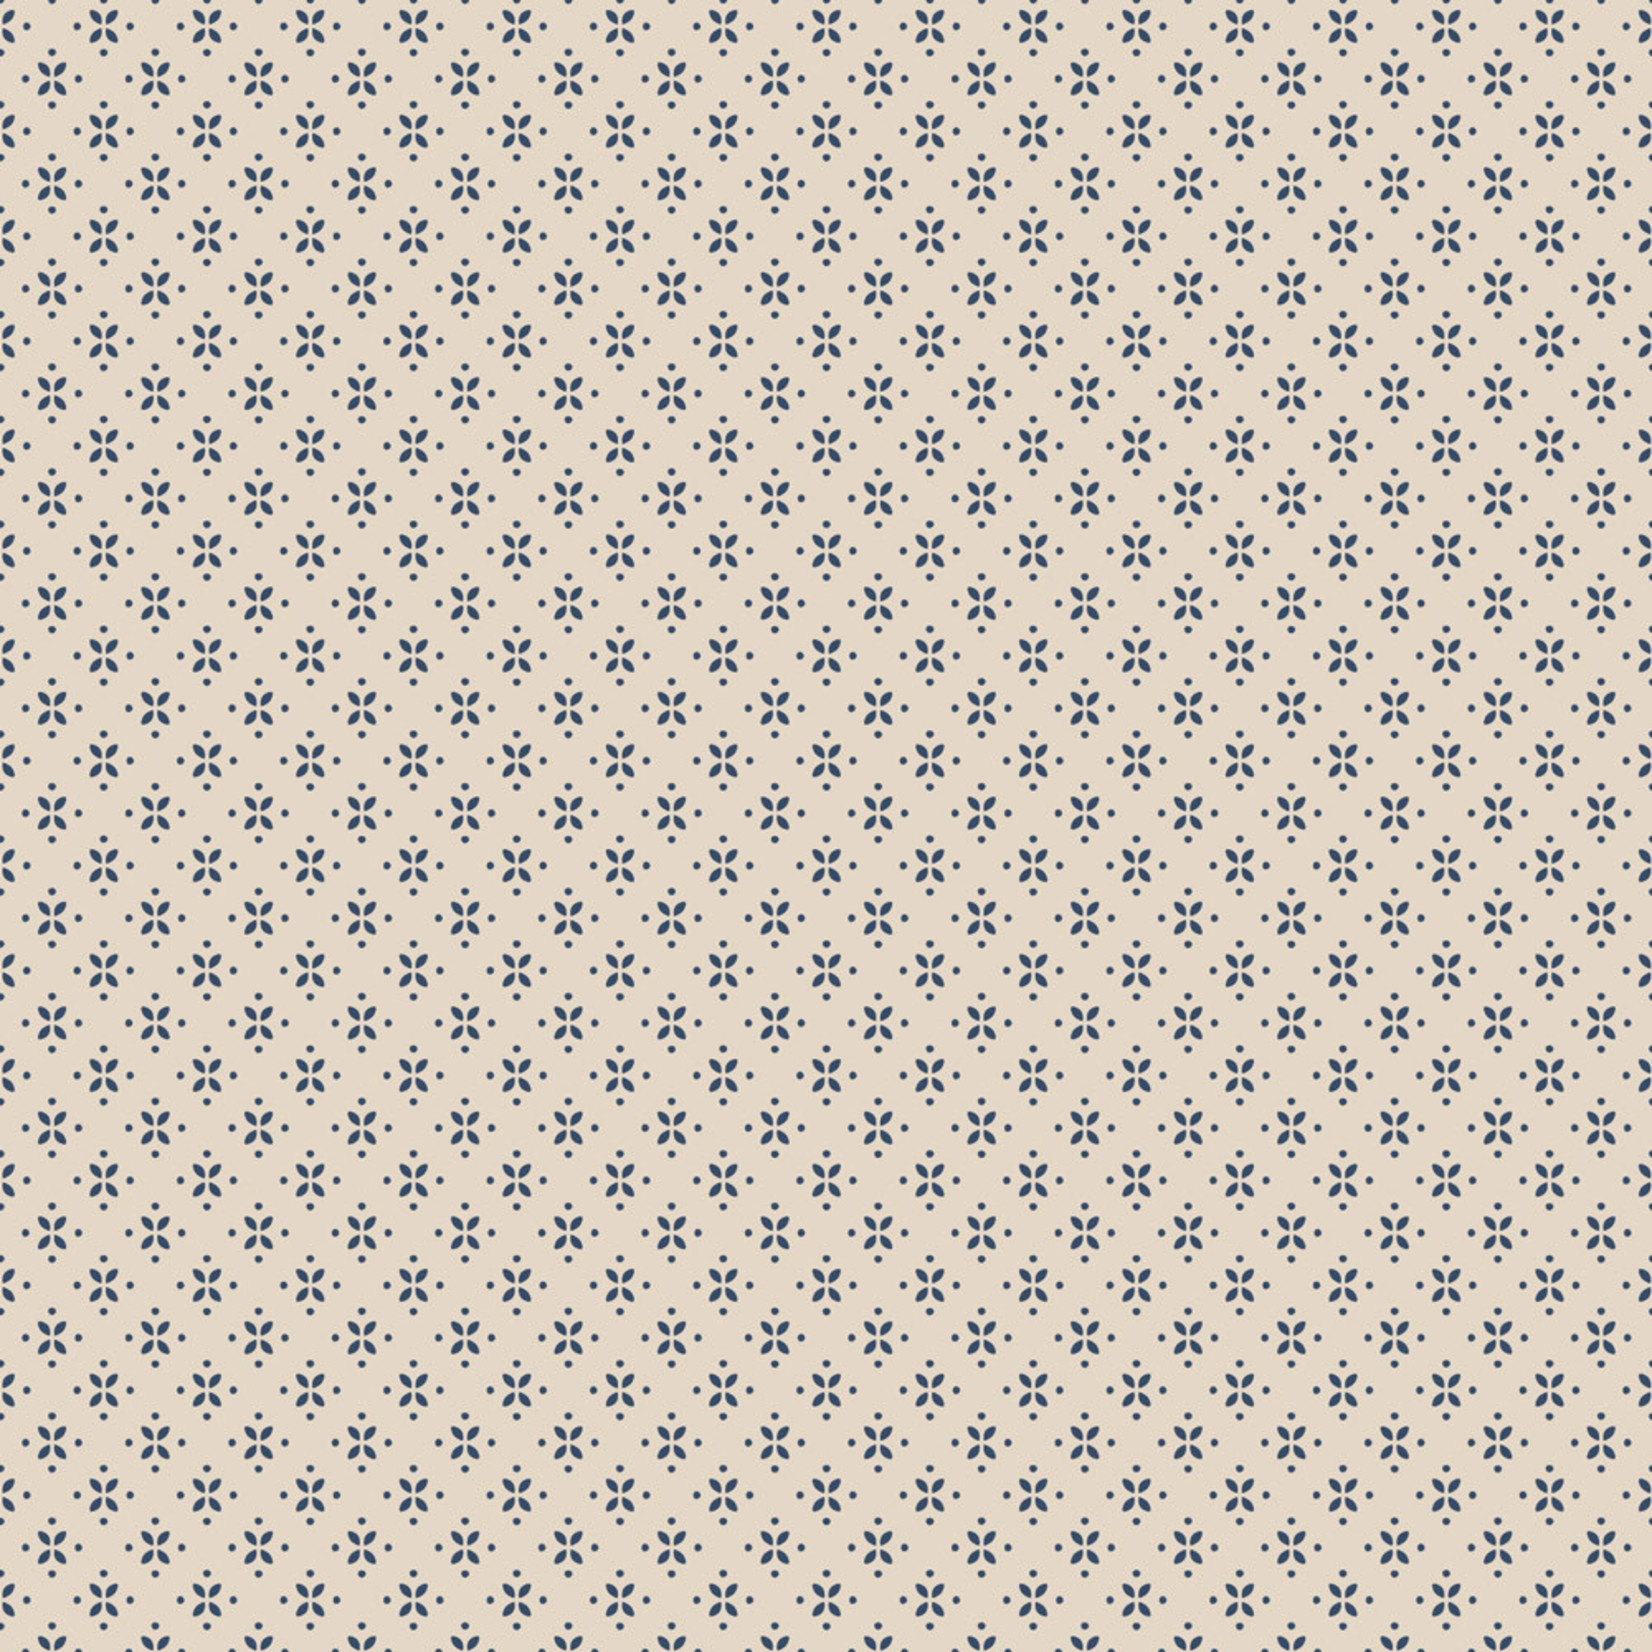 Stoffabrics Nellies Shirtlings - Diamonds - Cream